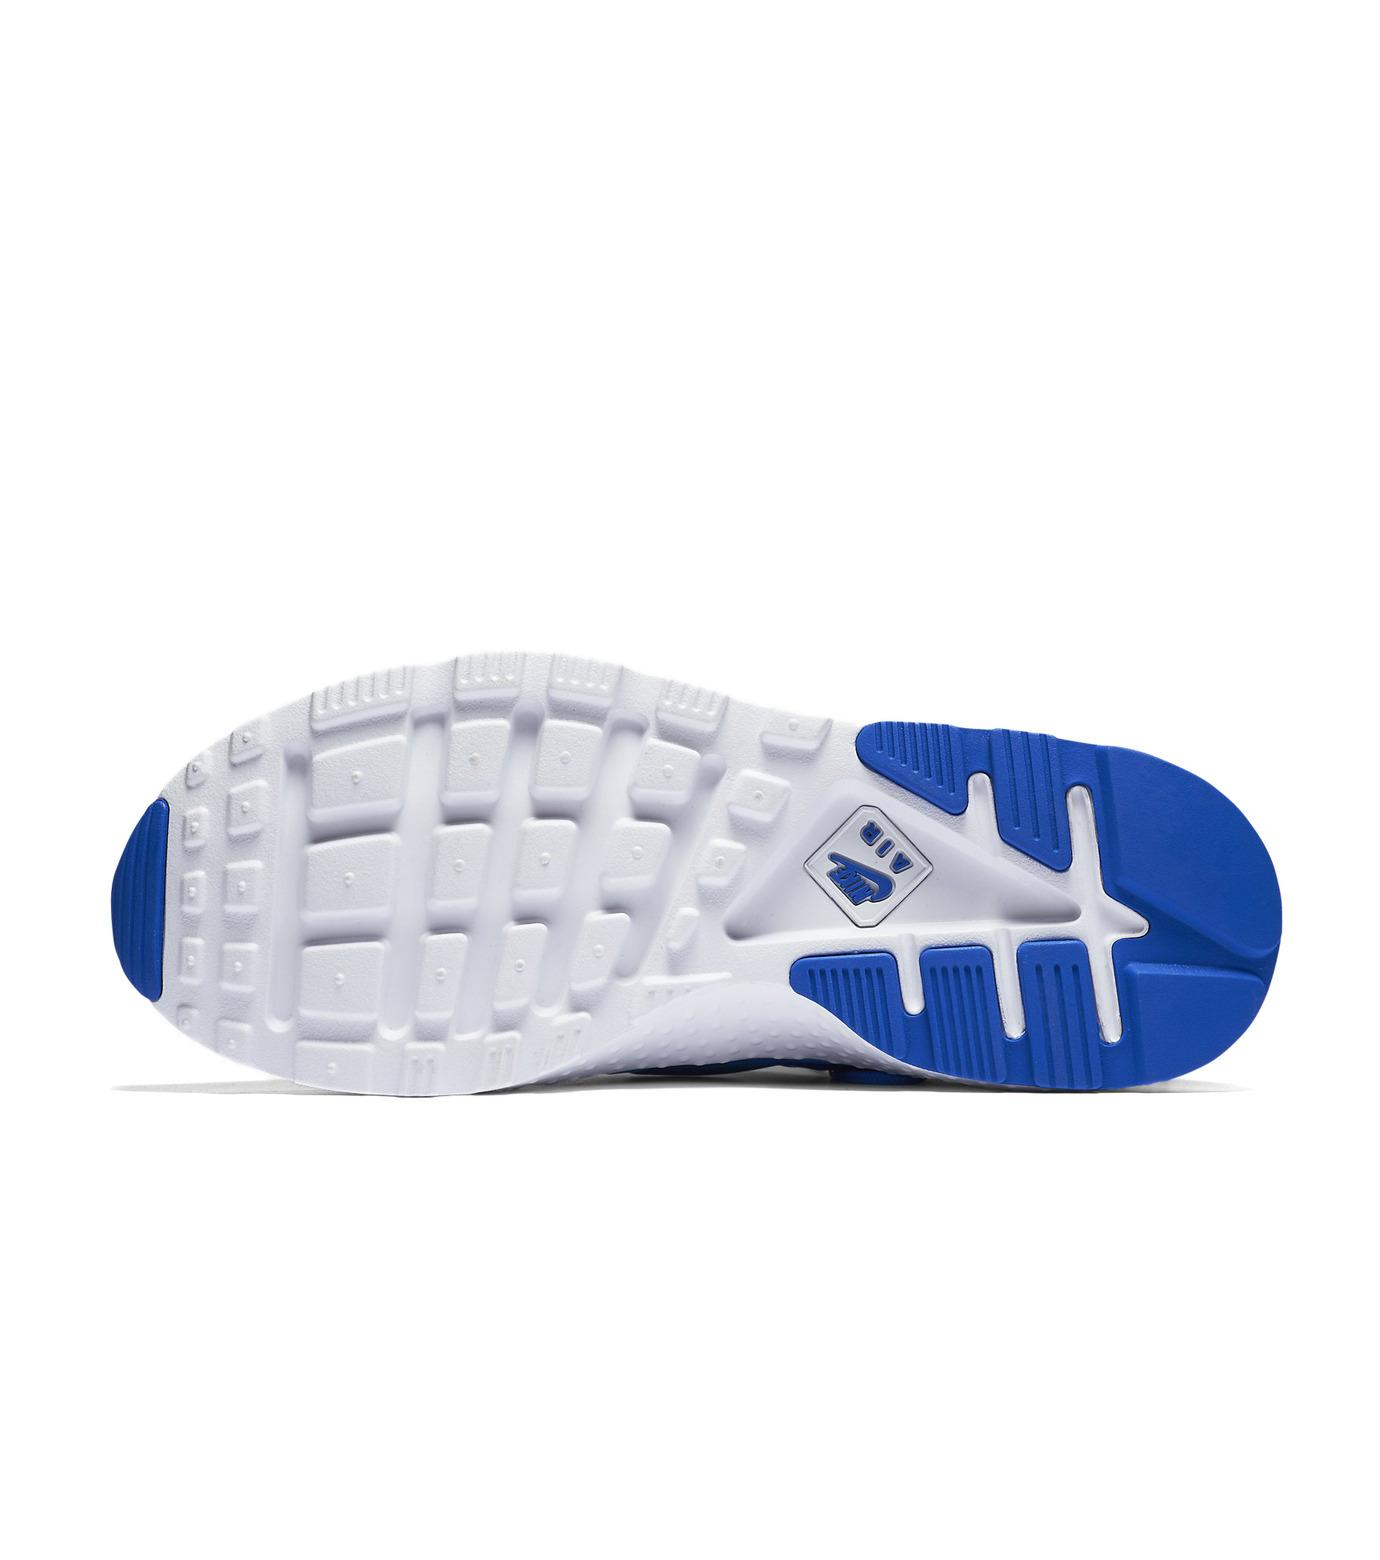 NIKE(ナイキ)のAIR HUARACHE RUN-BLUE(シューズ/shoes)-819151-400-92 拡大詳細画像2